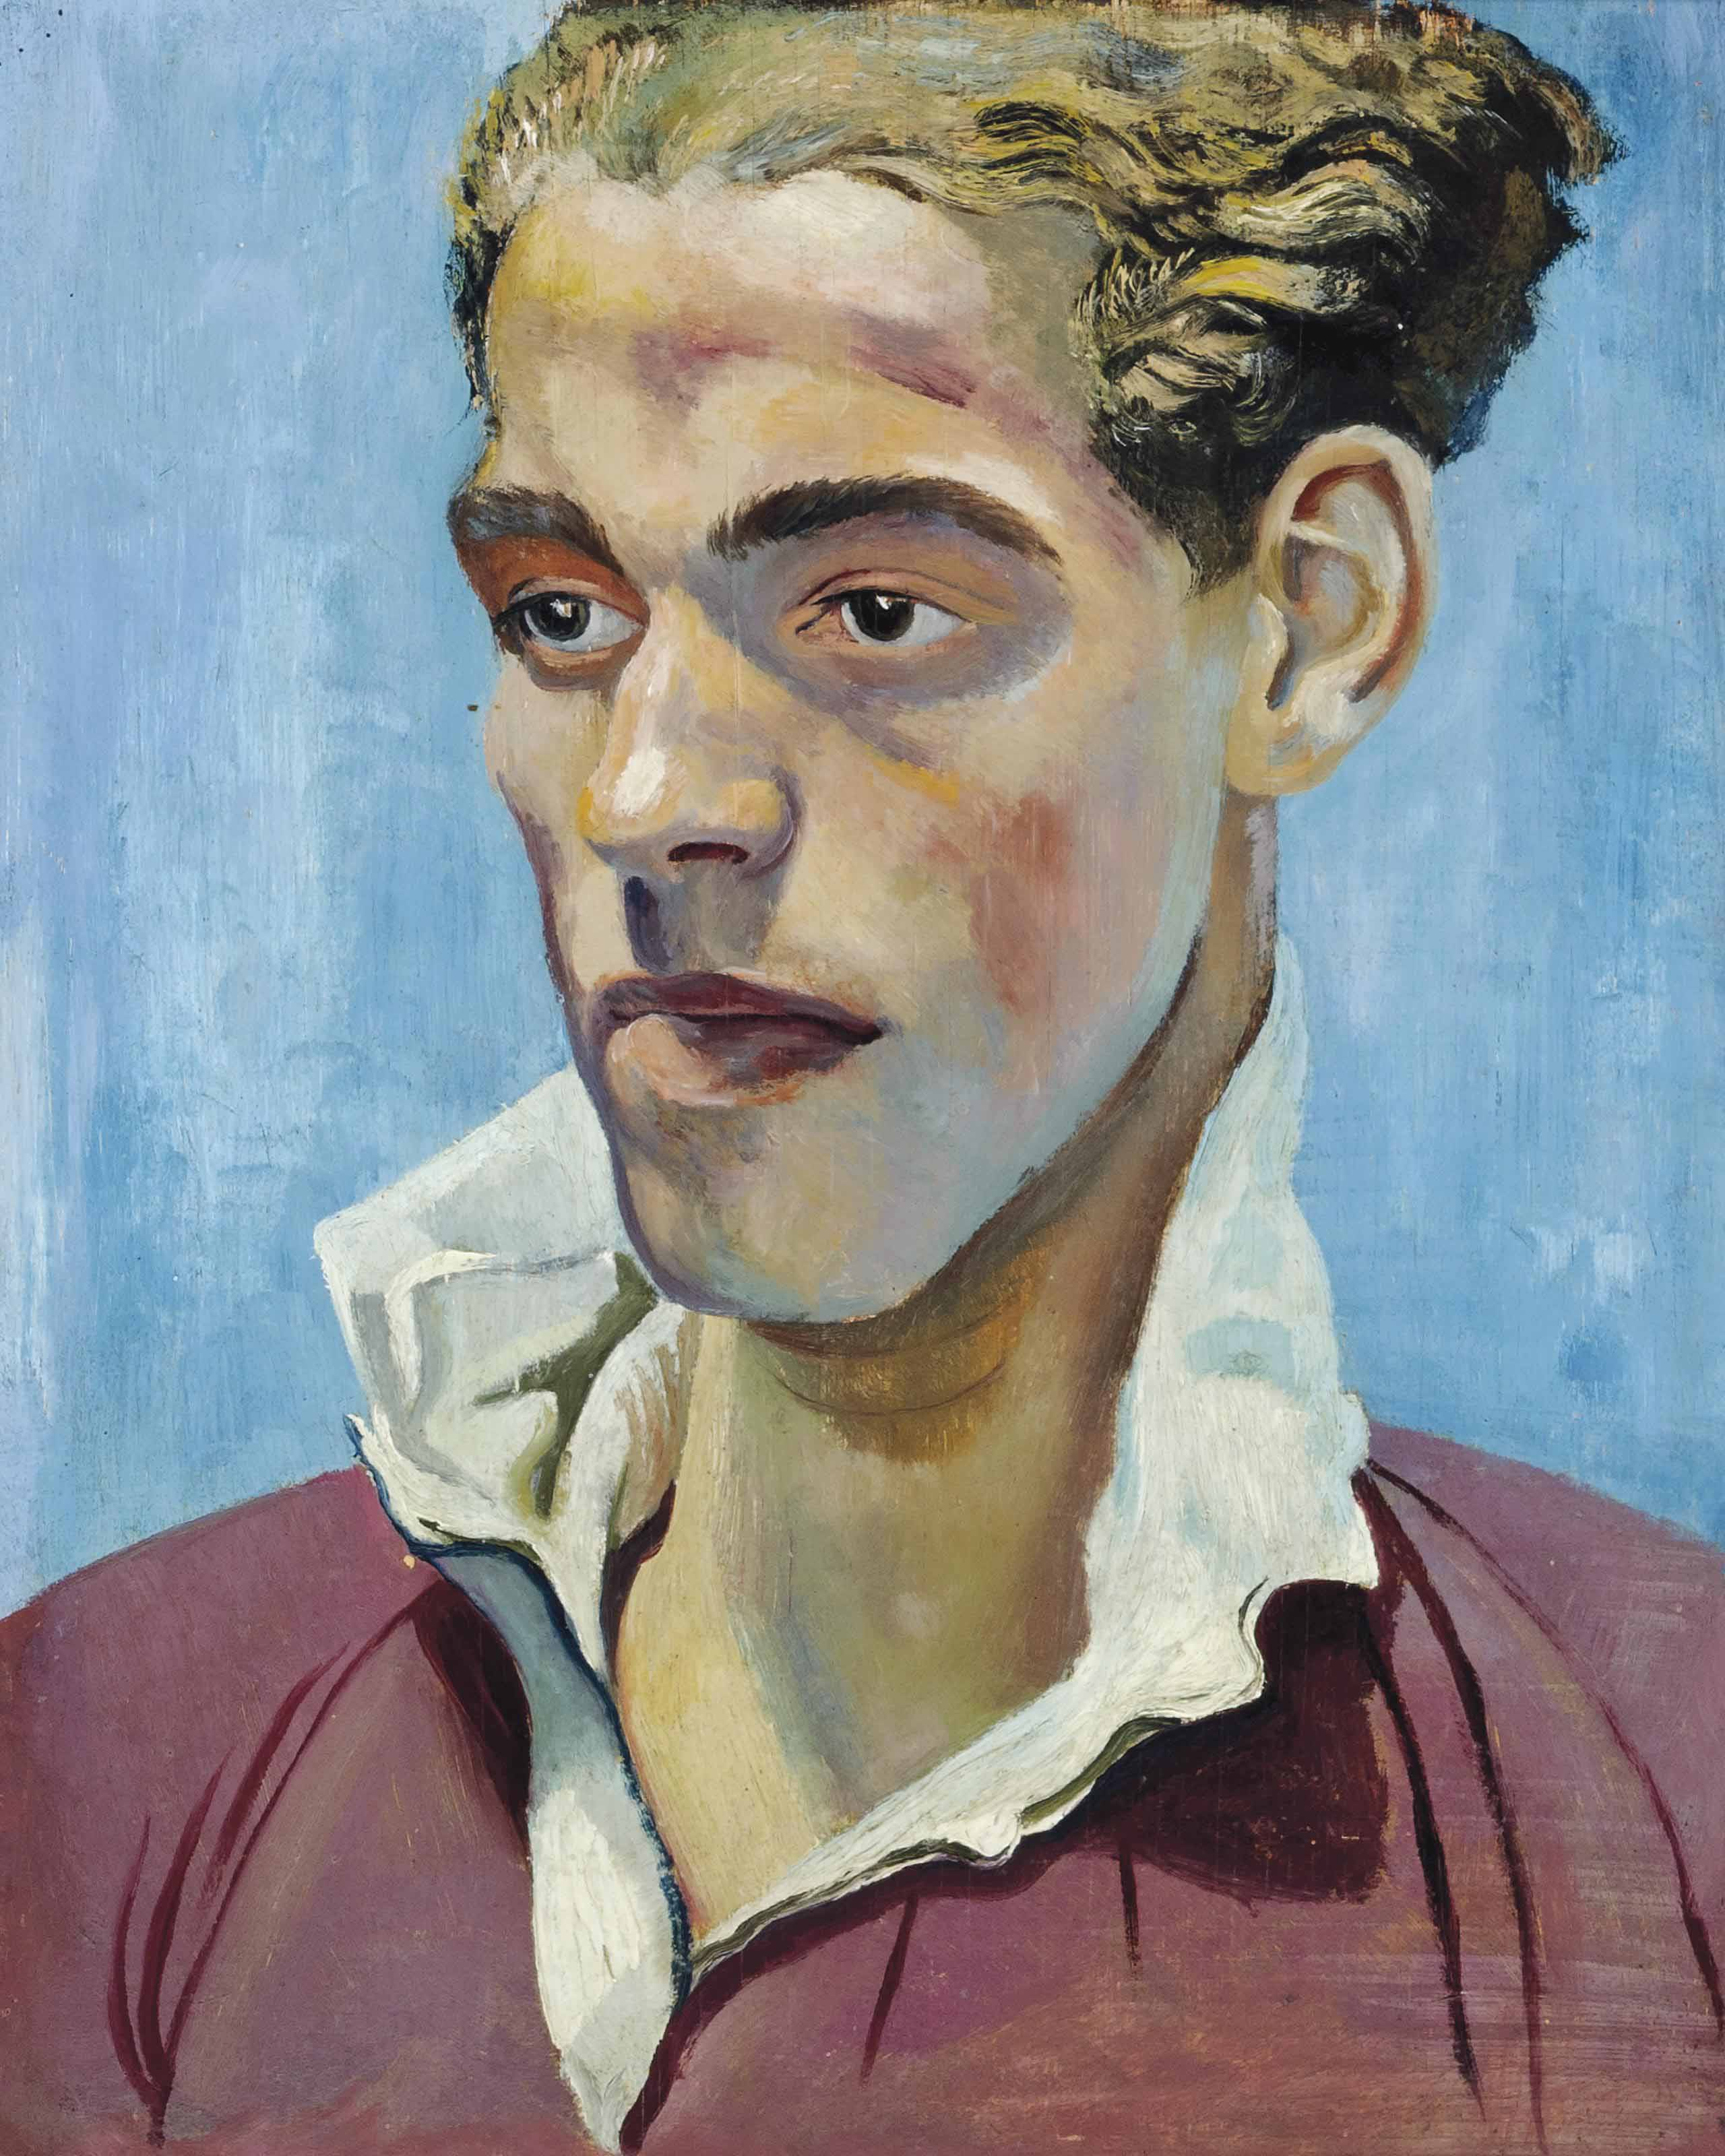 John, the artist's brother